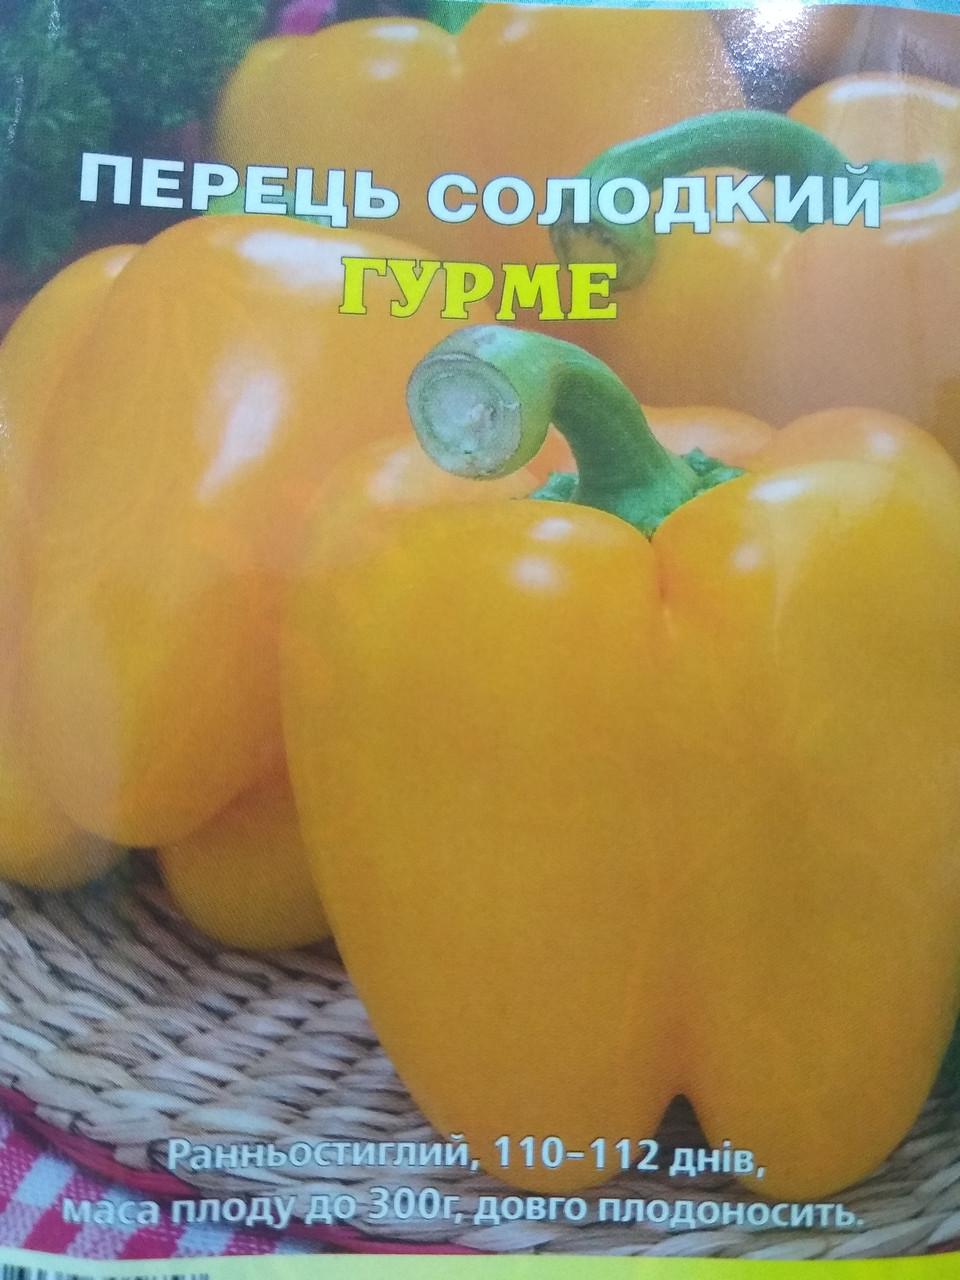 Семена среднеспелого перца сладкий Гурме 10 грамм семян упаковка Украина